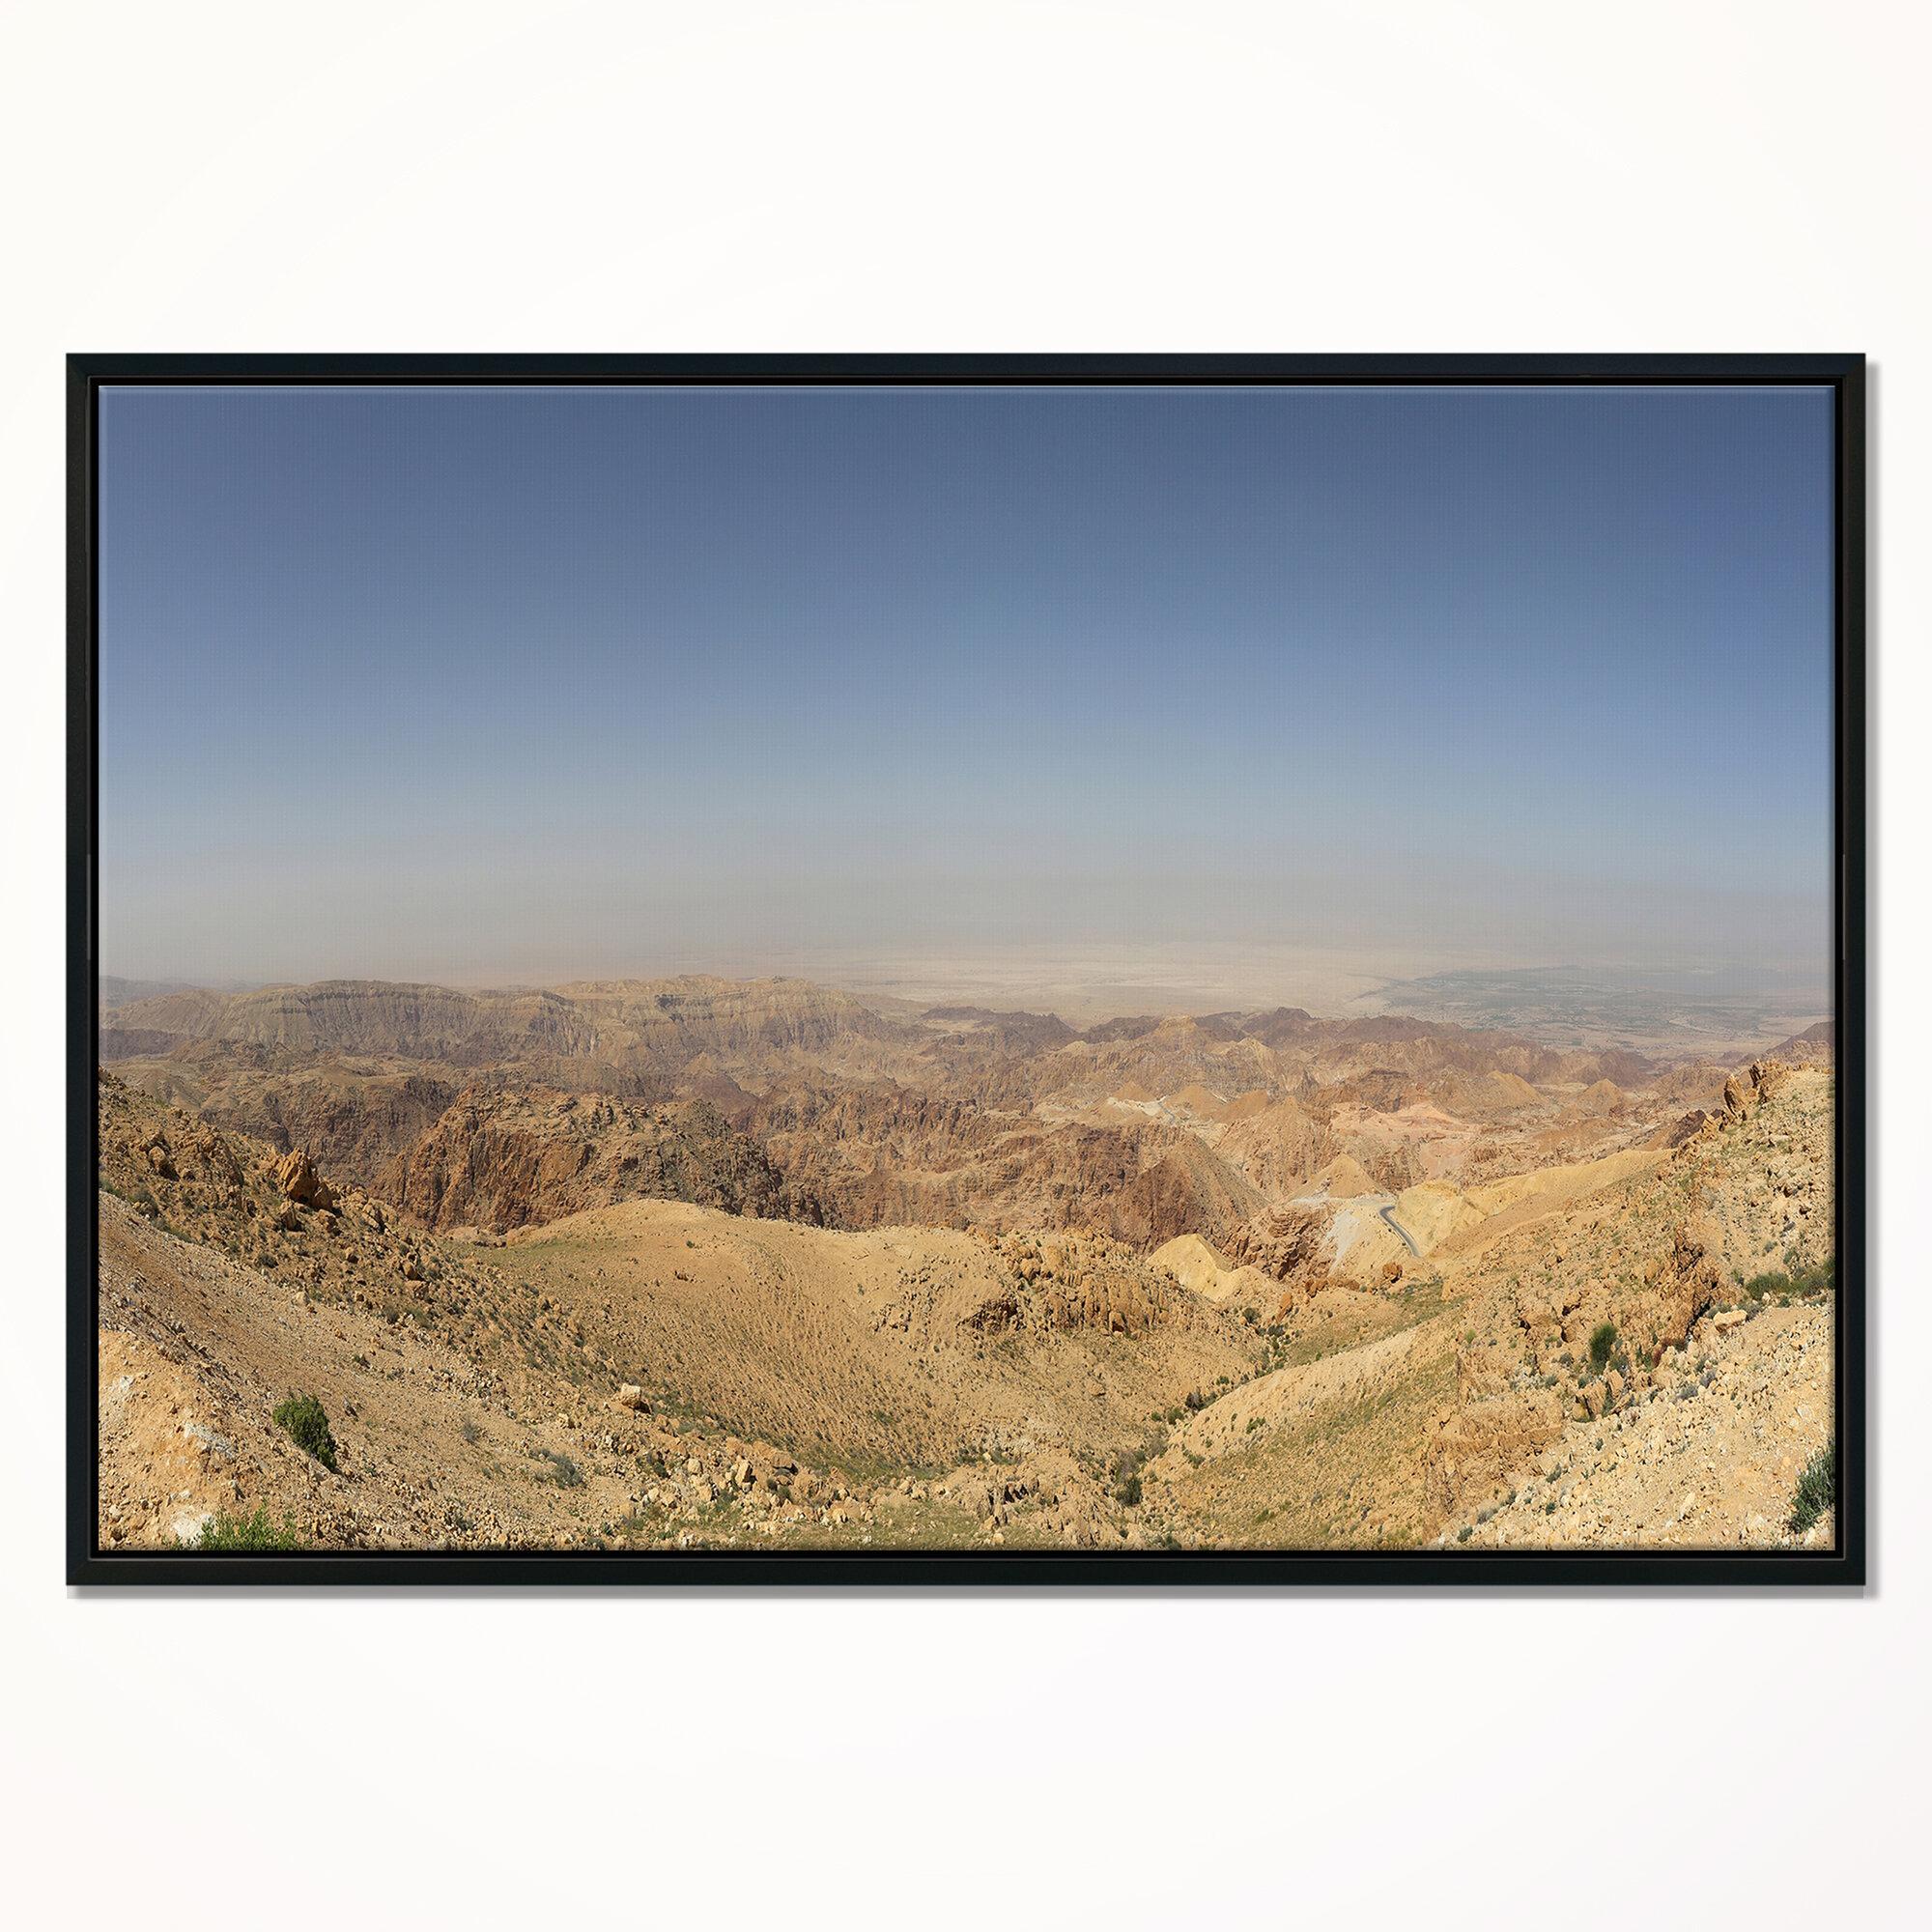 East Urban Home Panorama Desert Hills Jordan Framed Photograph On Canvas Wayfair